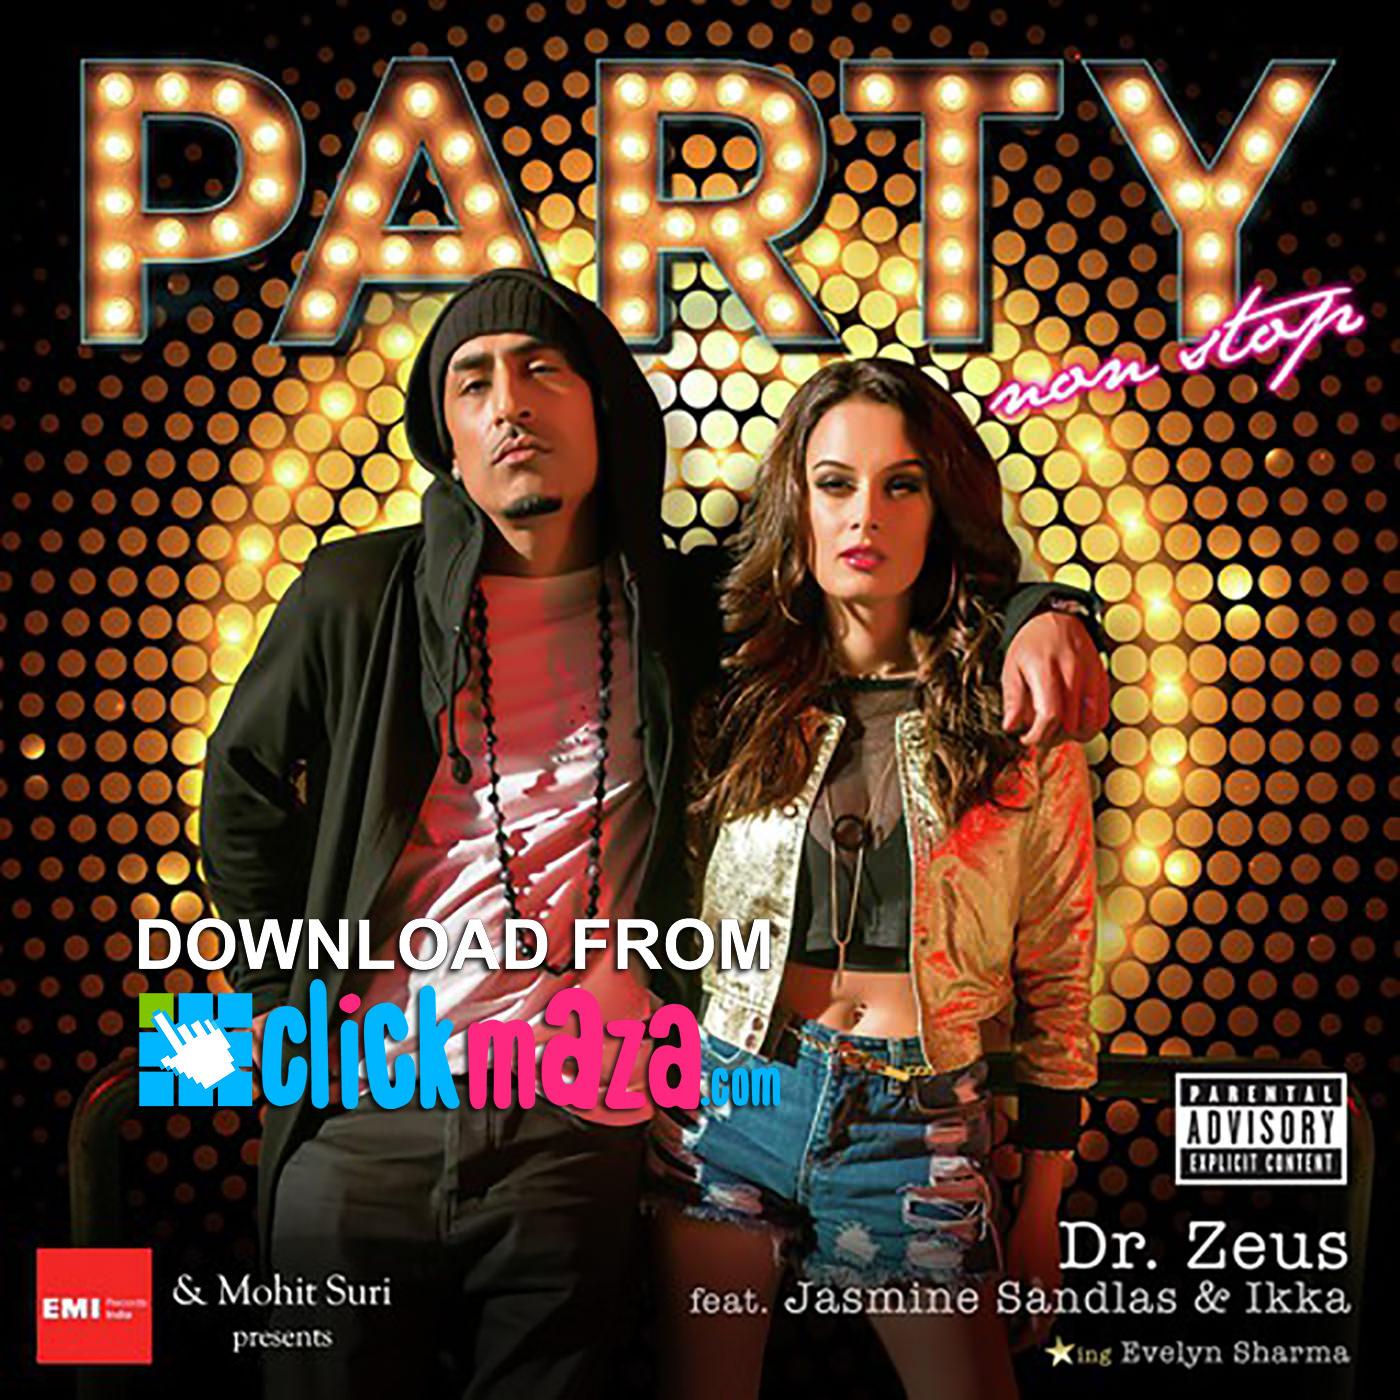 Download Song Daroo Party By Pagalworld: Dj Brajesh Ishanagar : Party Nonstop